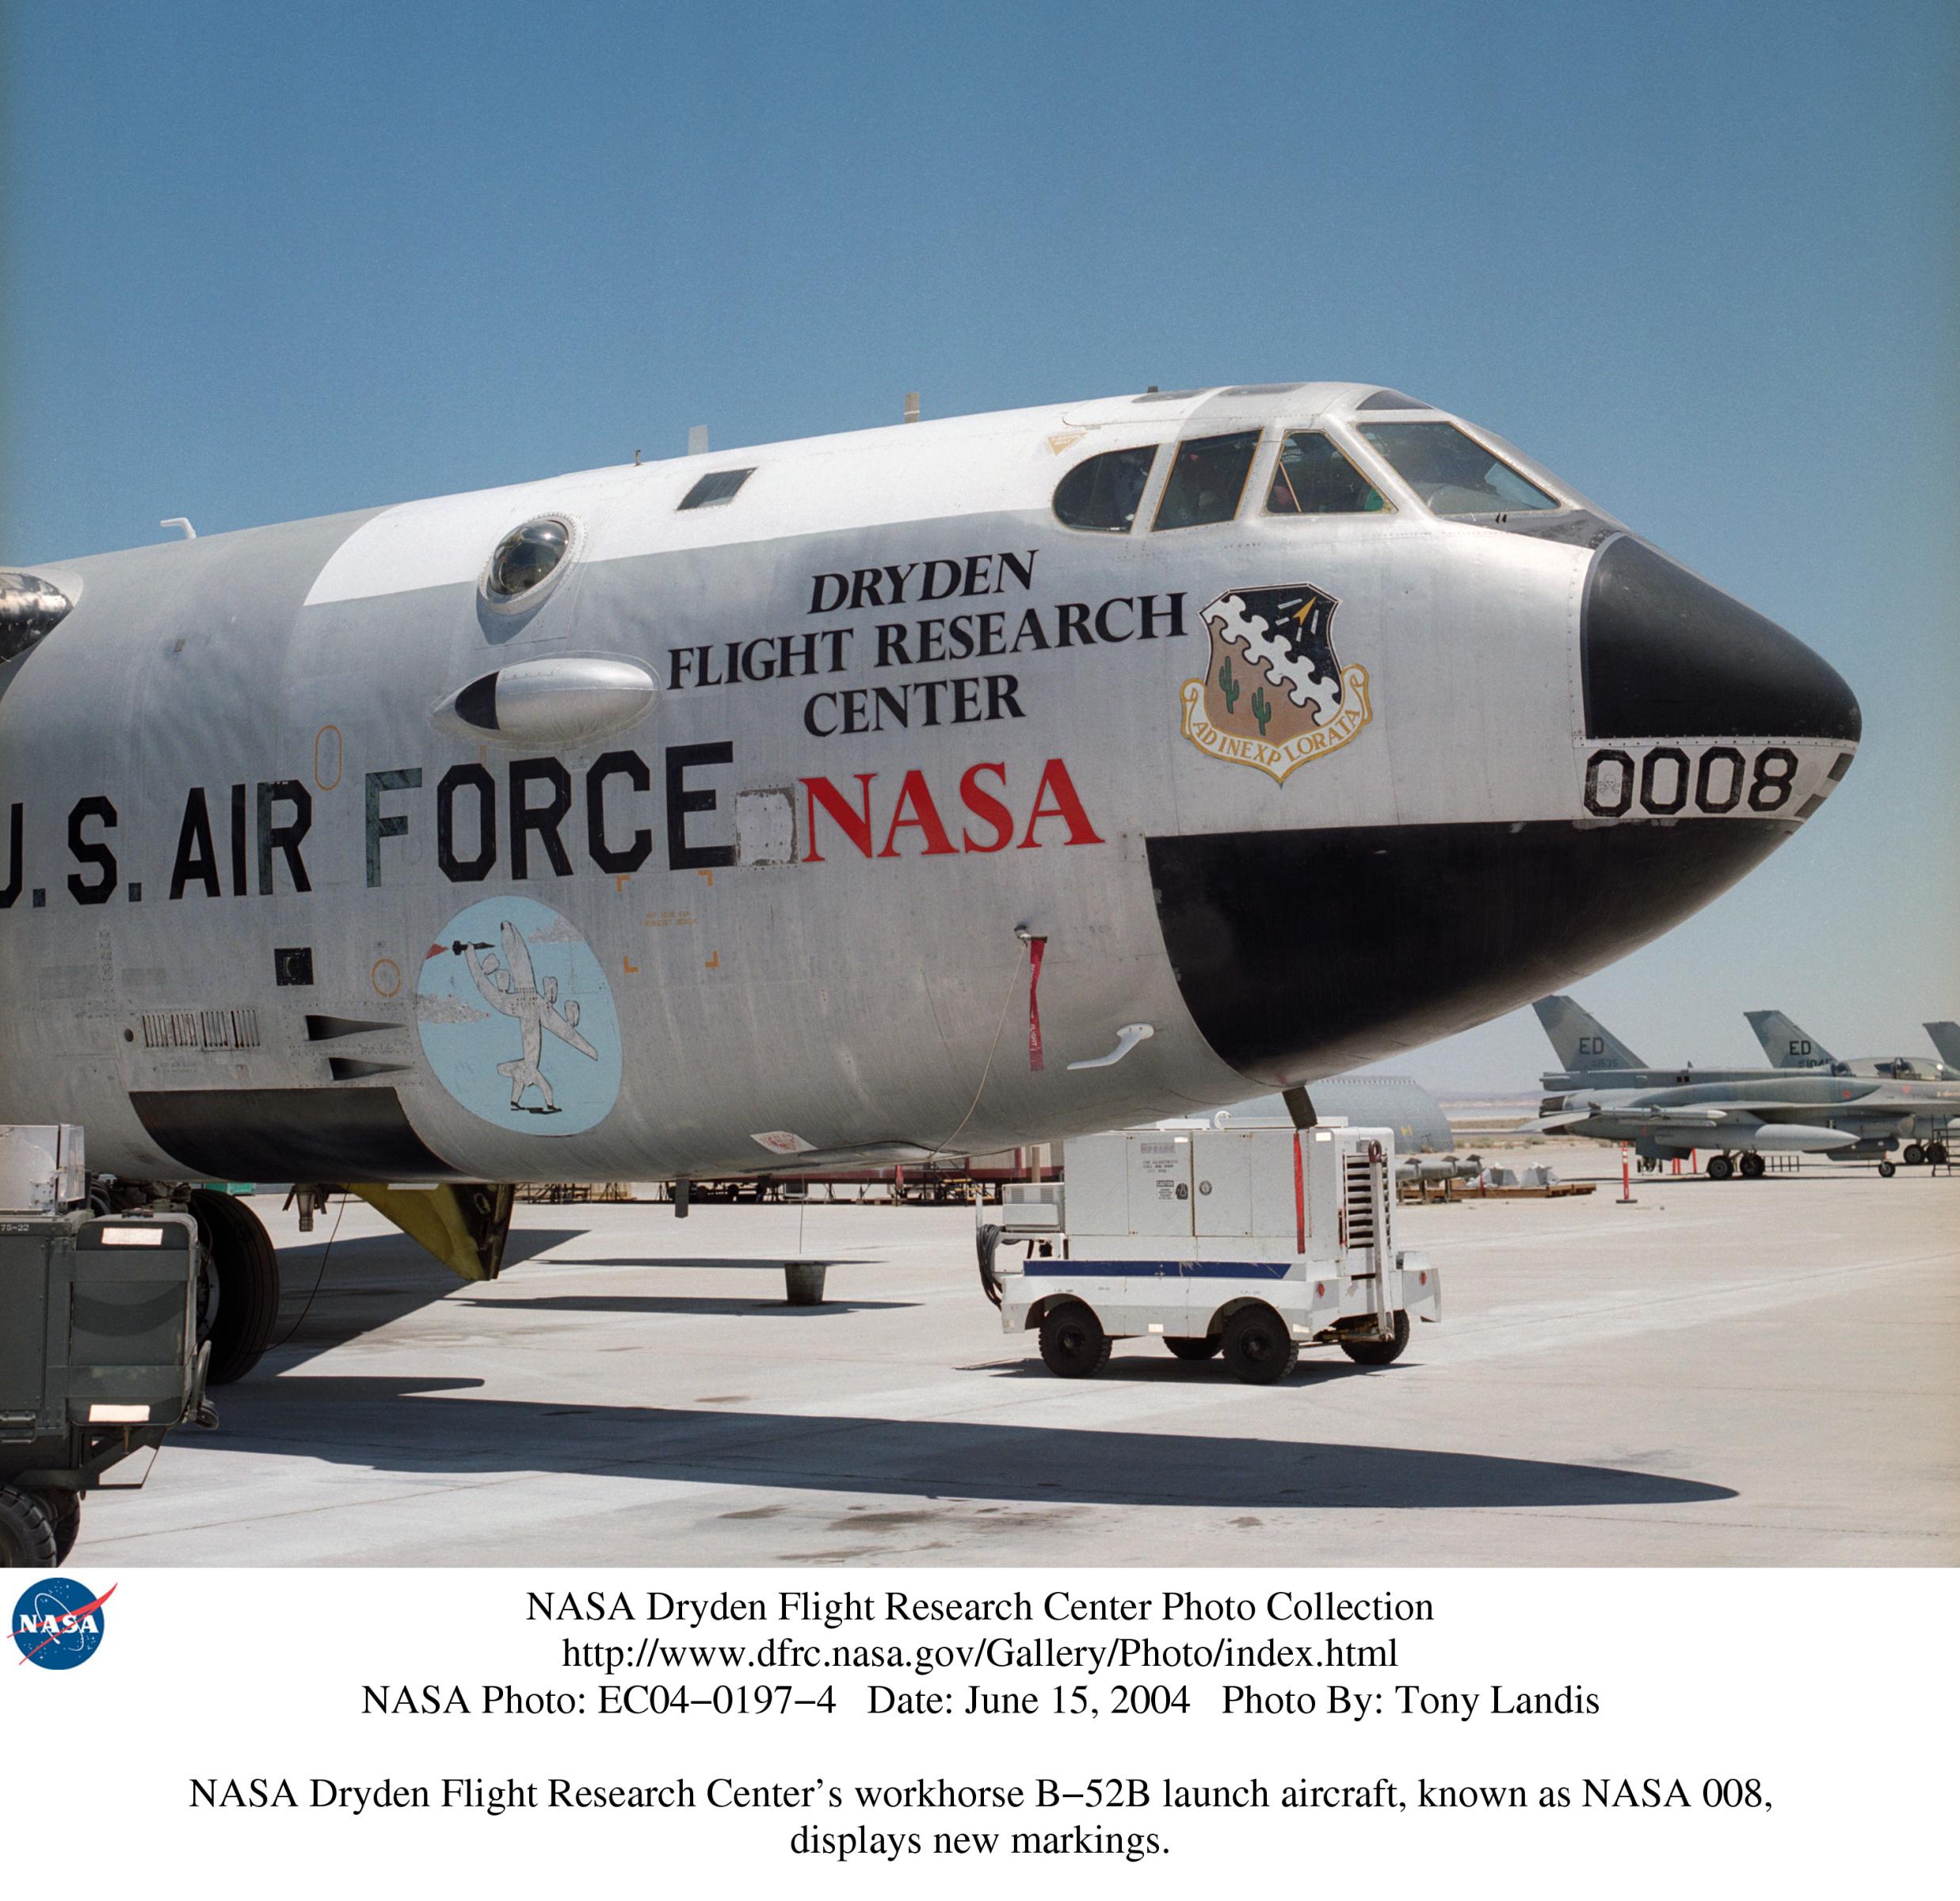 nasa b-52 - photo #12